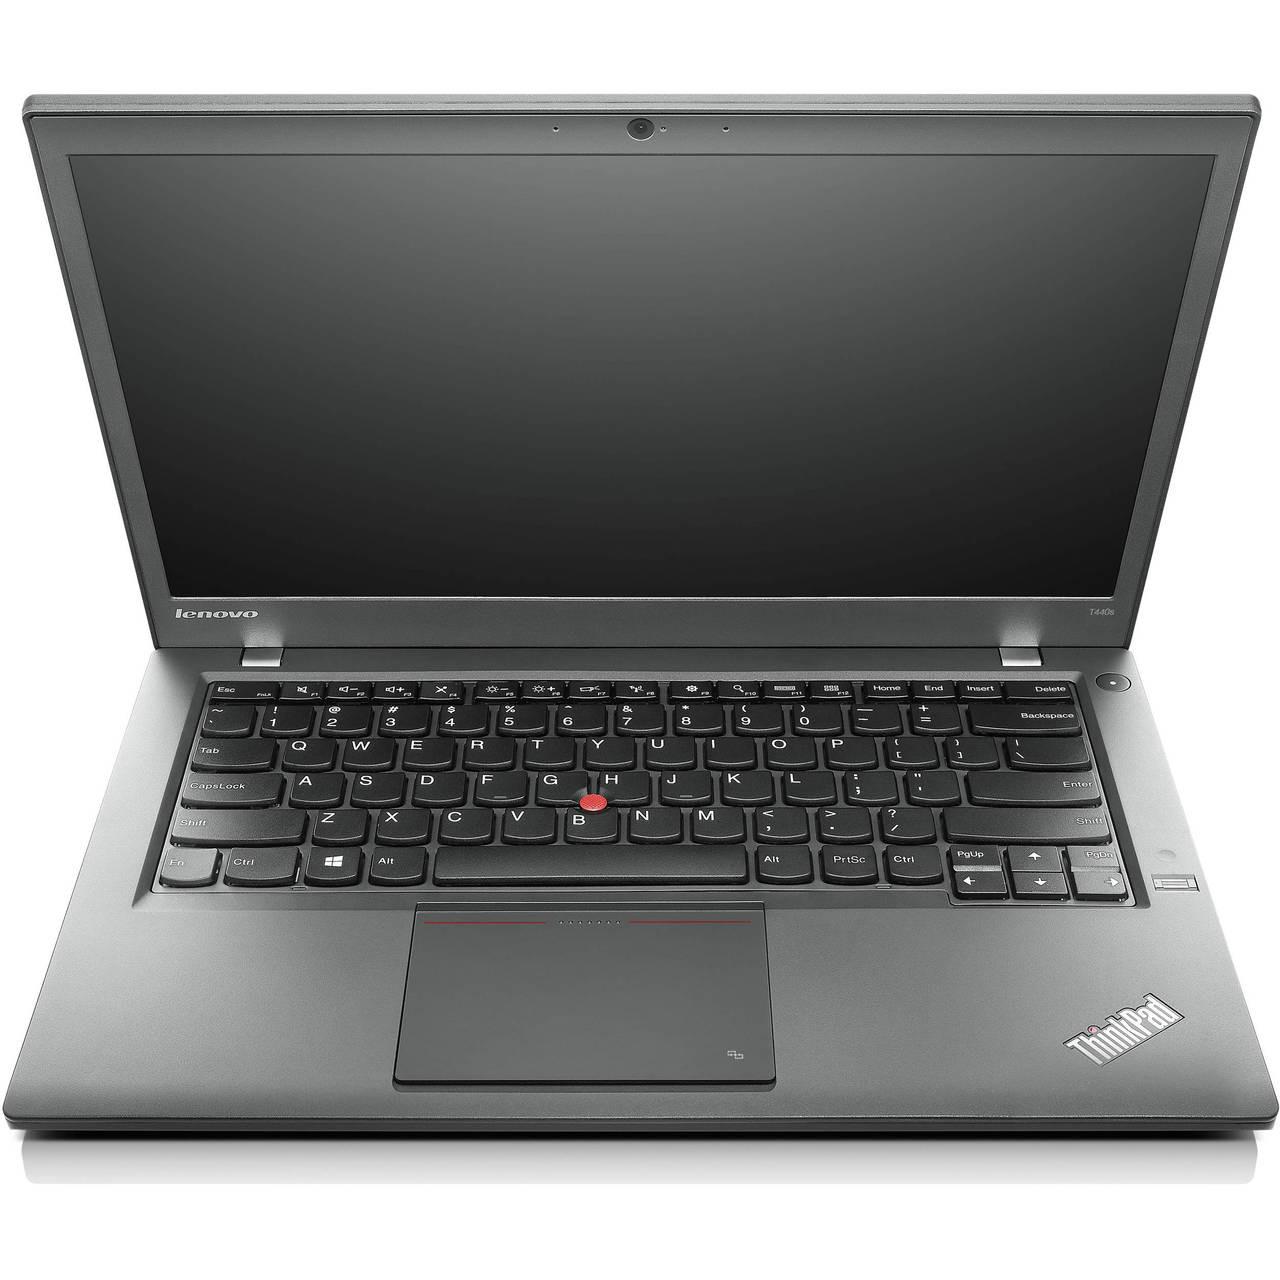 Lenovo ThinkPad T440s Ultrabook - Intel i7 - 2 10GHz, 8GB, 240GB SDD, 14